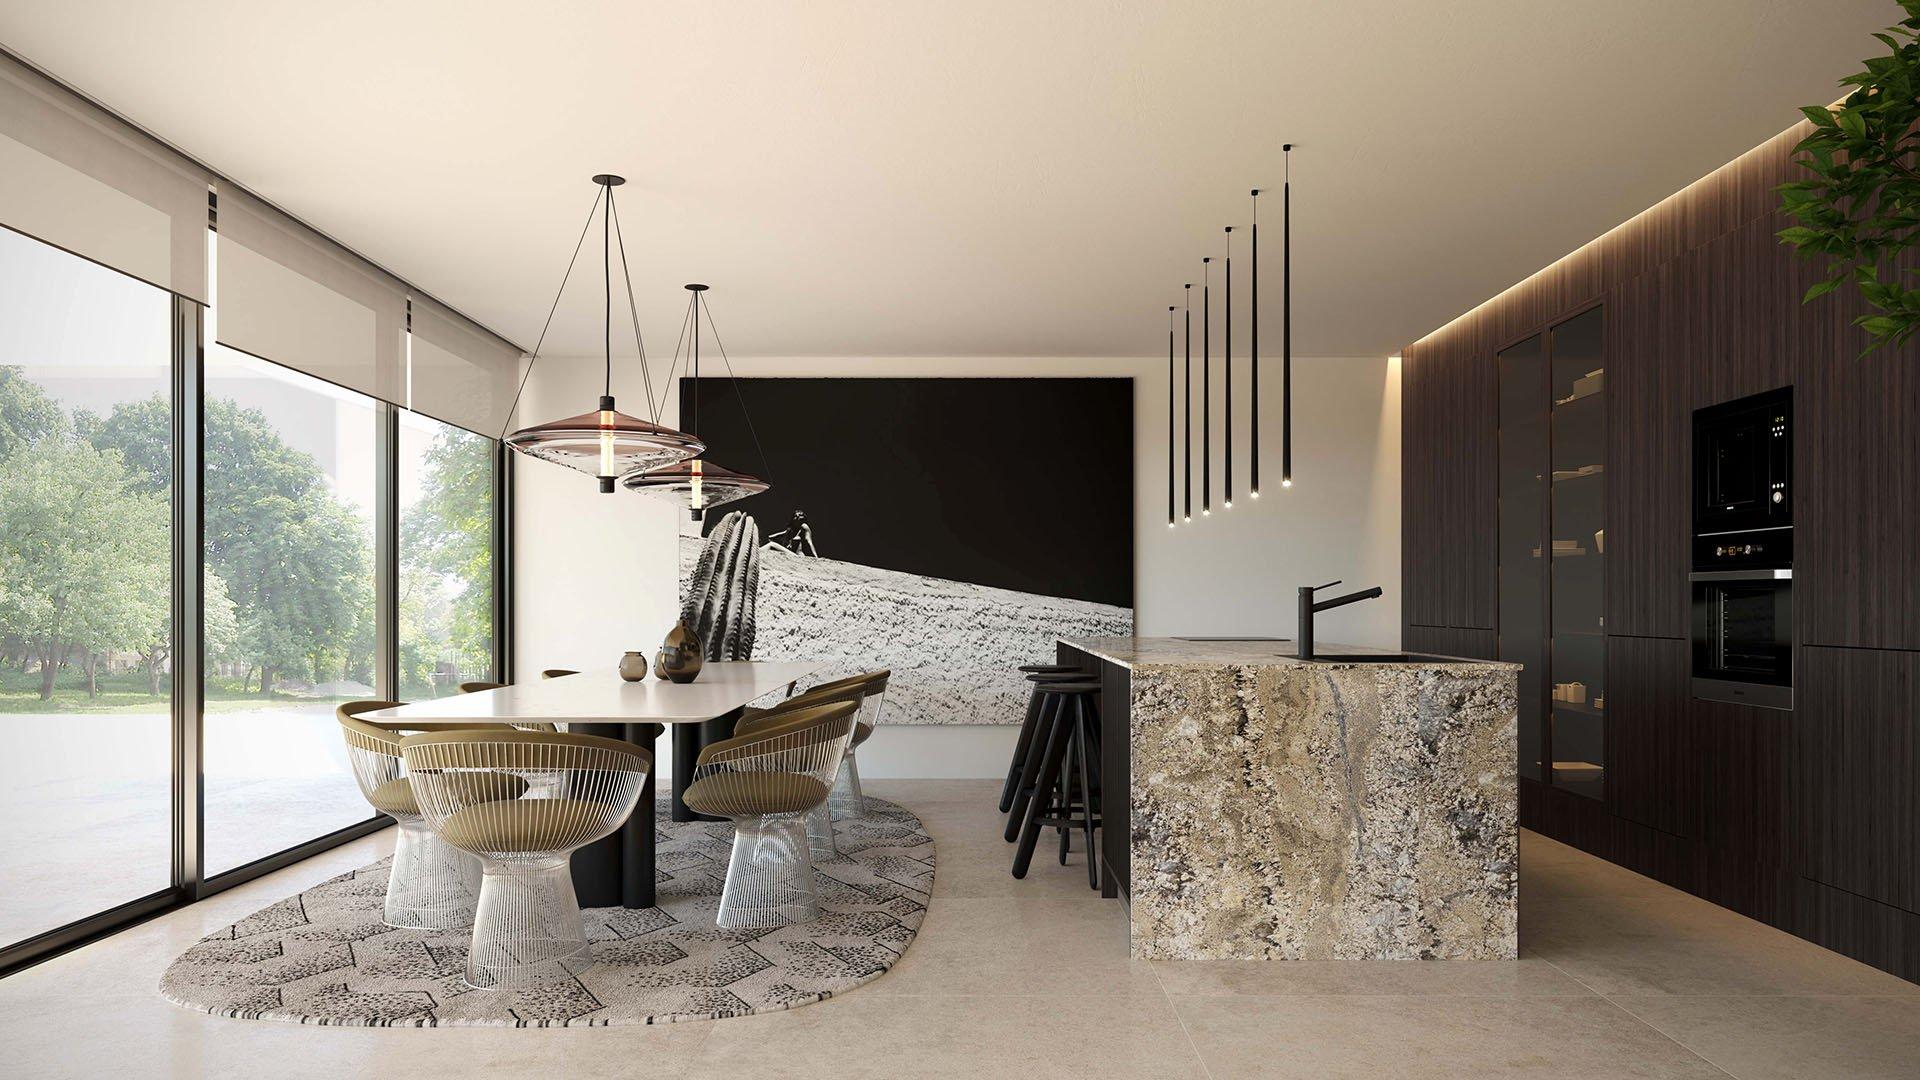 Marein Banus: Luxury villas 50 meters from the beach in Puerto Banús